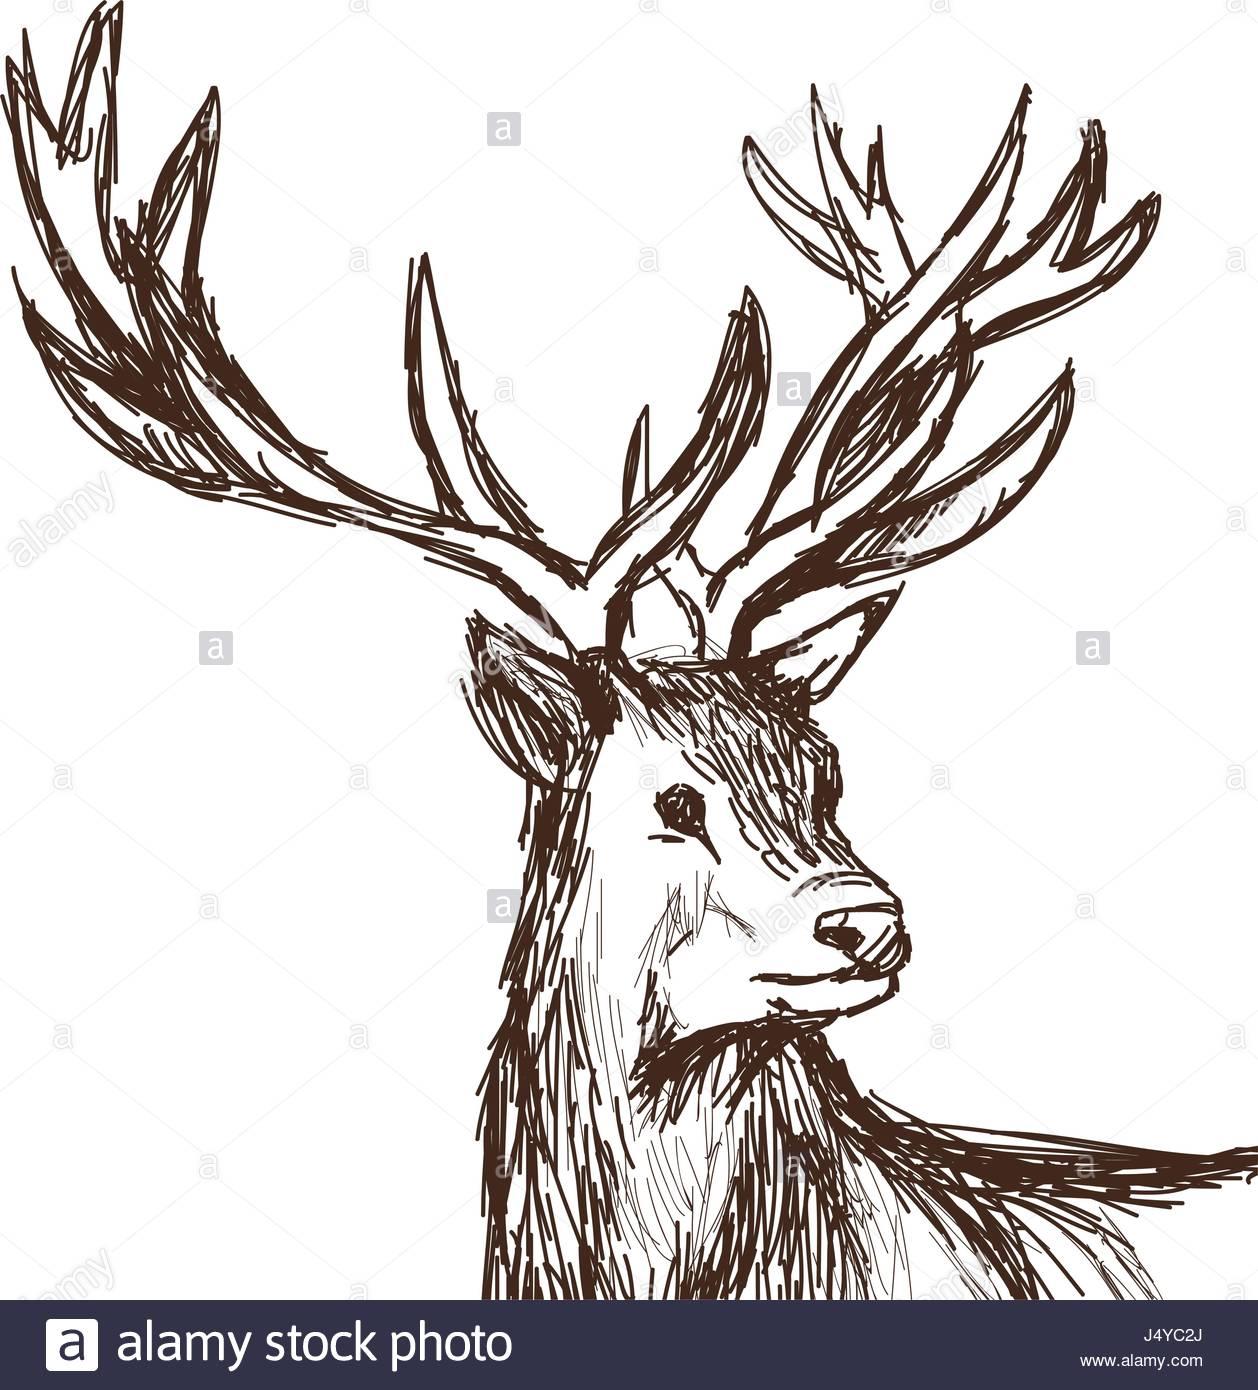 1258x1390 Hand Drawn Deer Big Antlers, Wildlife Poster. Face Graphic Sketch